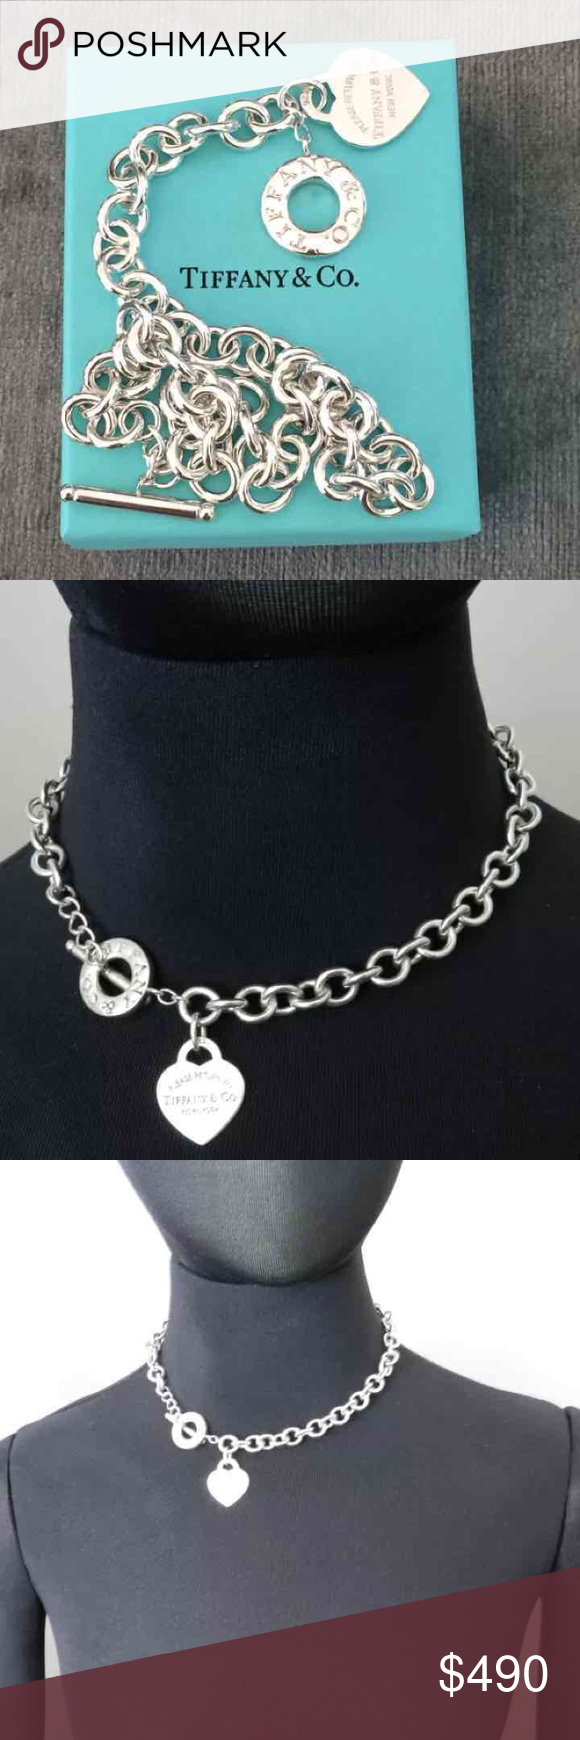 31++ Where can i sell my tiffany jewelry near me ideas